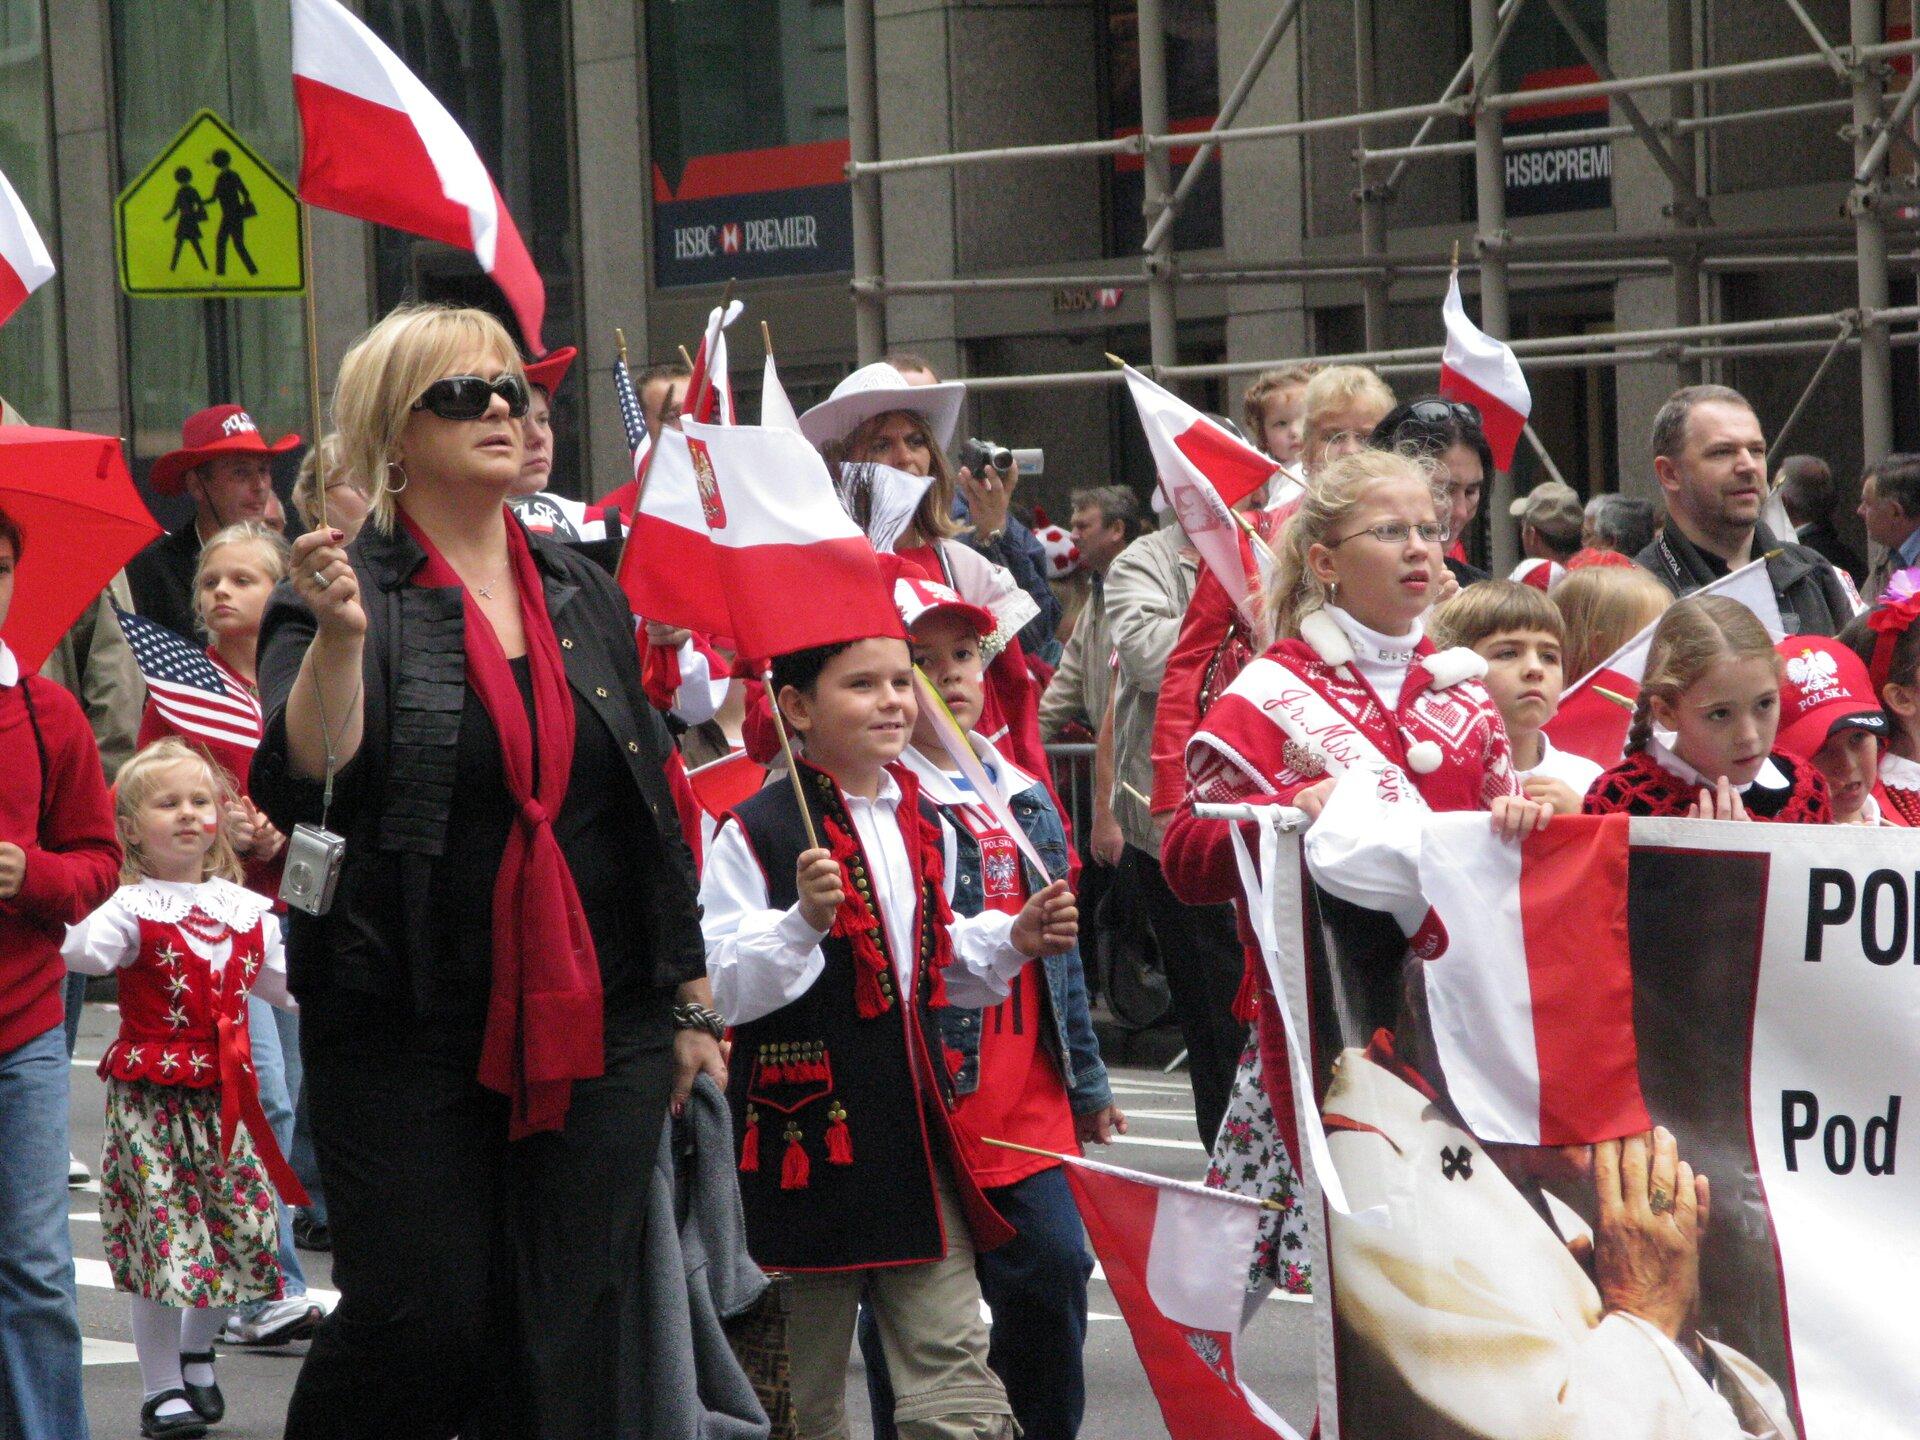 Polsko-amerykańska parada wNowym Jorku Źródło: Salon Nowojorski, Polsko-amerykańska parada wNowym Jorku, licencja: CC BY-SA 2.0.